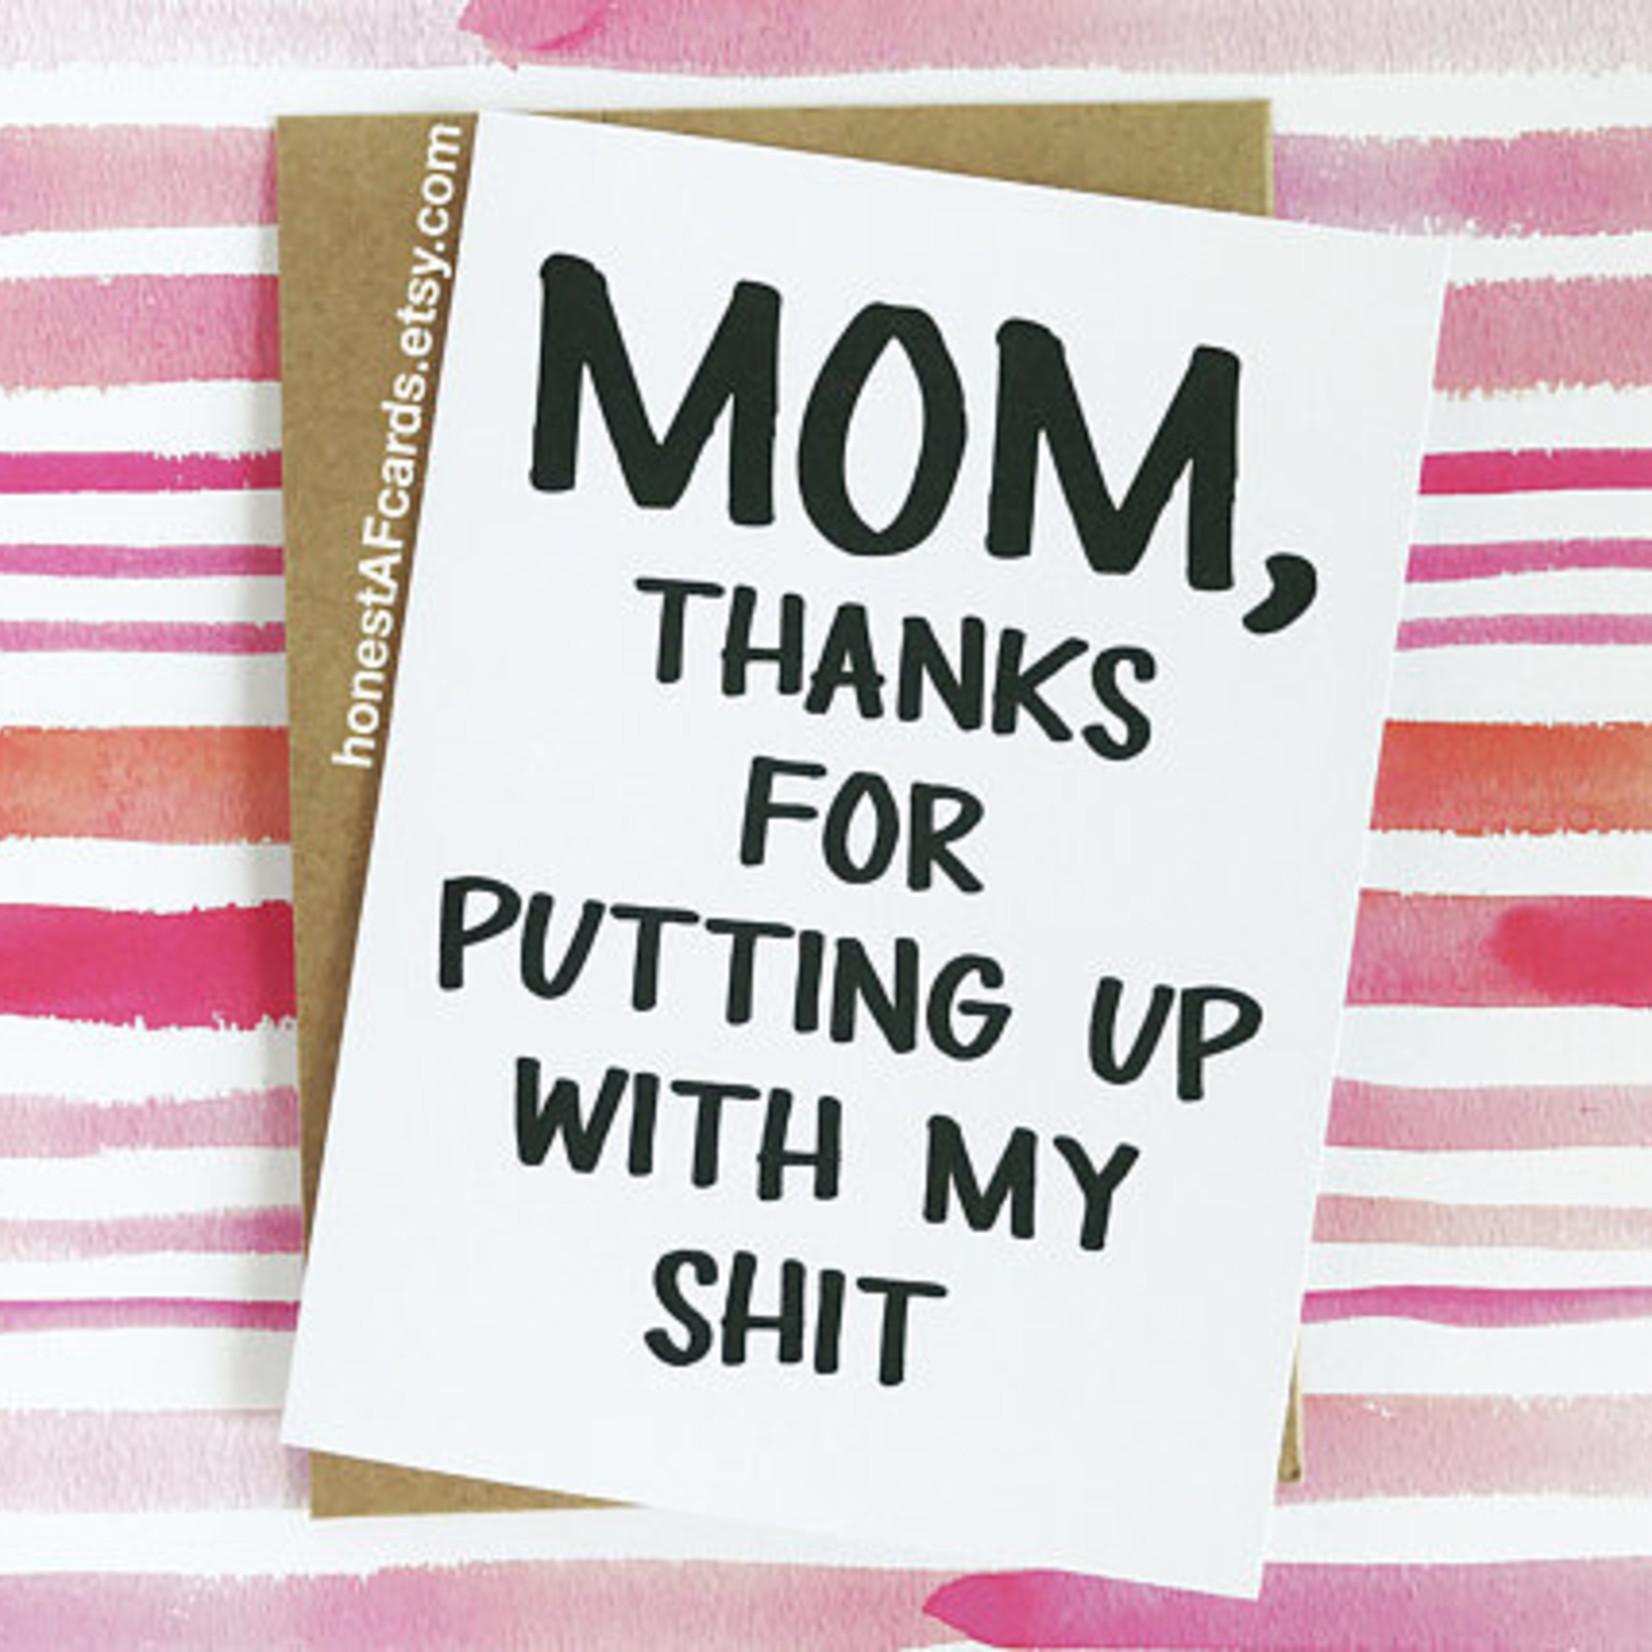 Honest AF Mom Putting Up with Shit